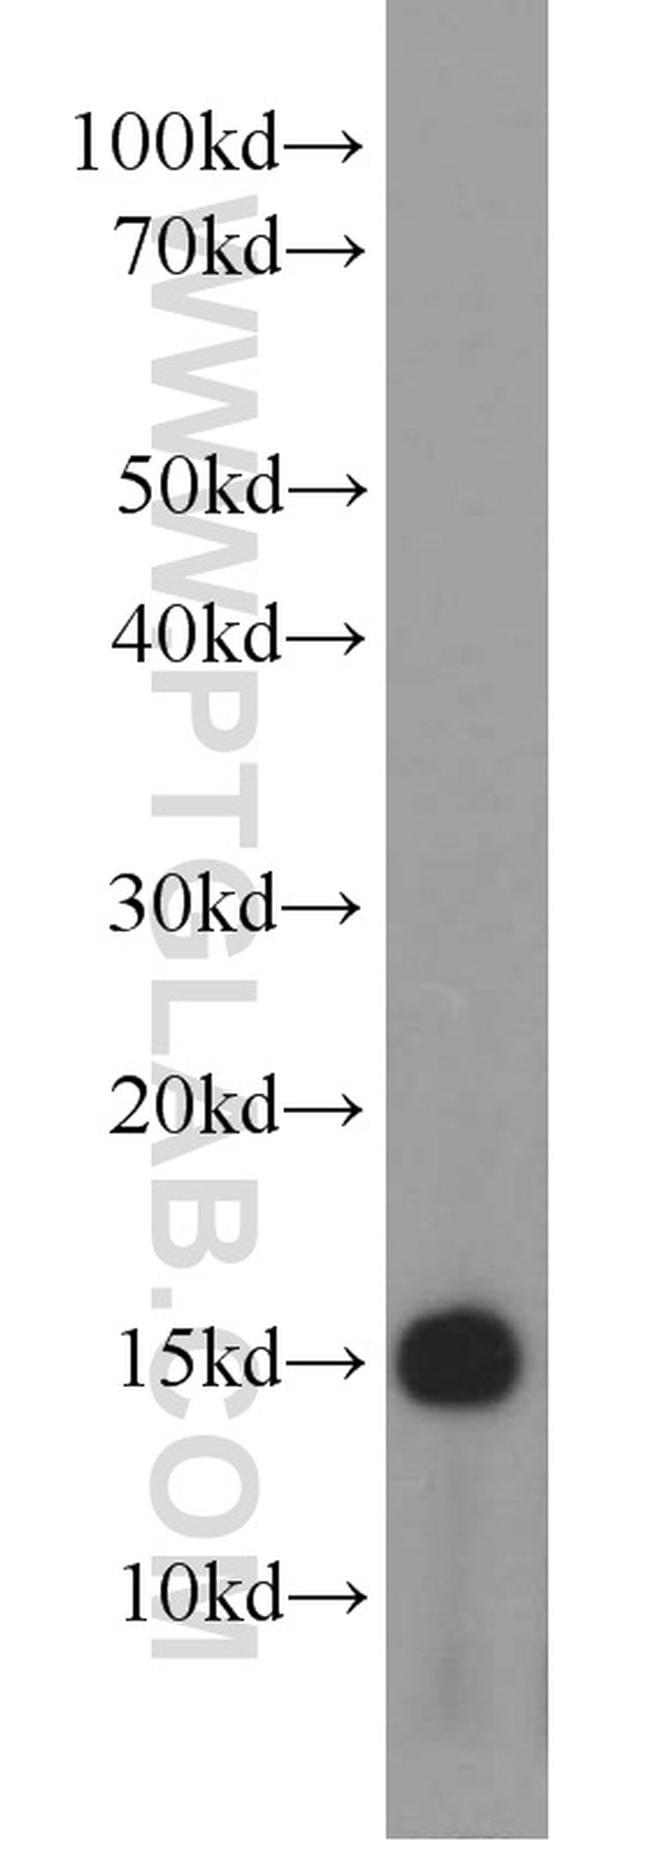 NHP2L1 Antibody in Western Blot (WB)